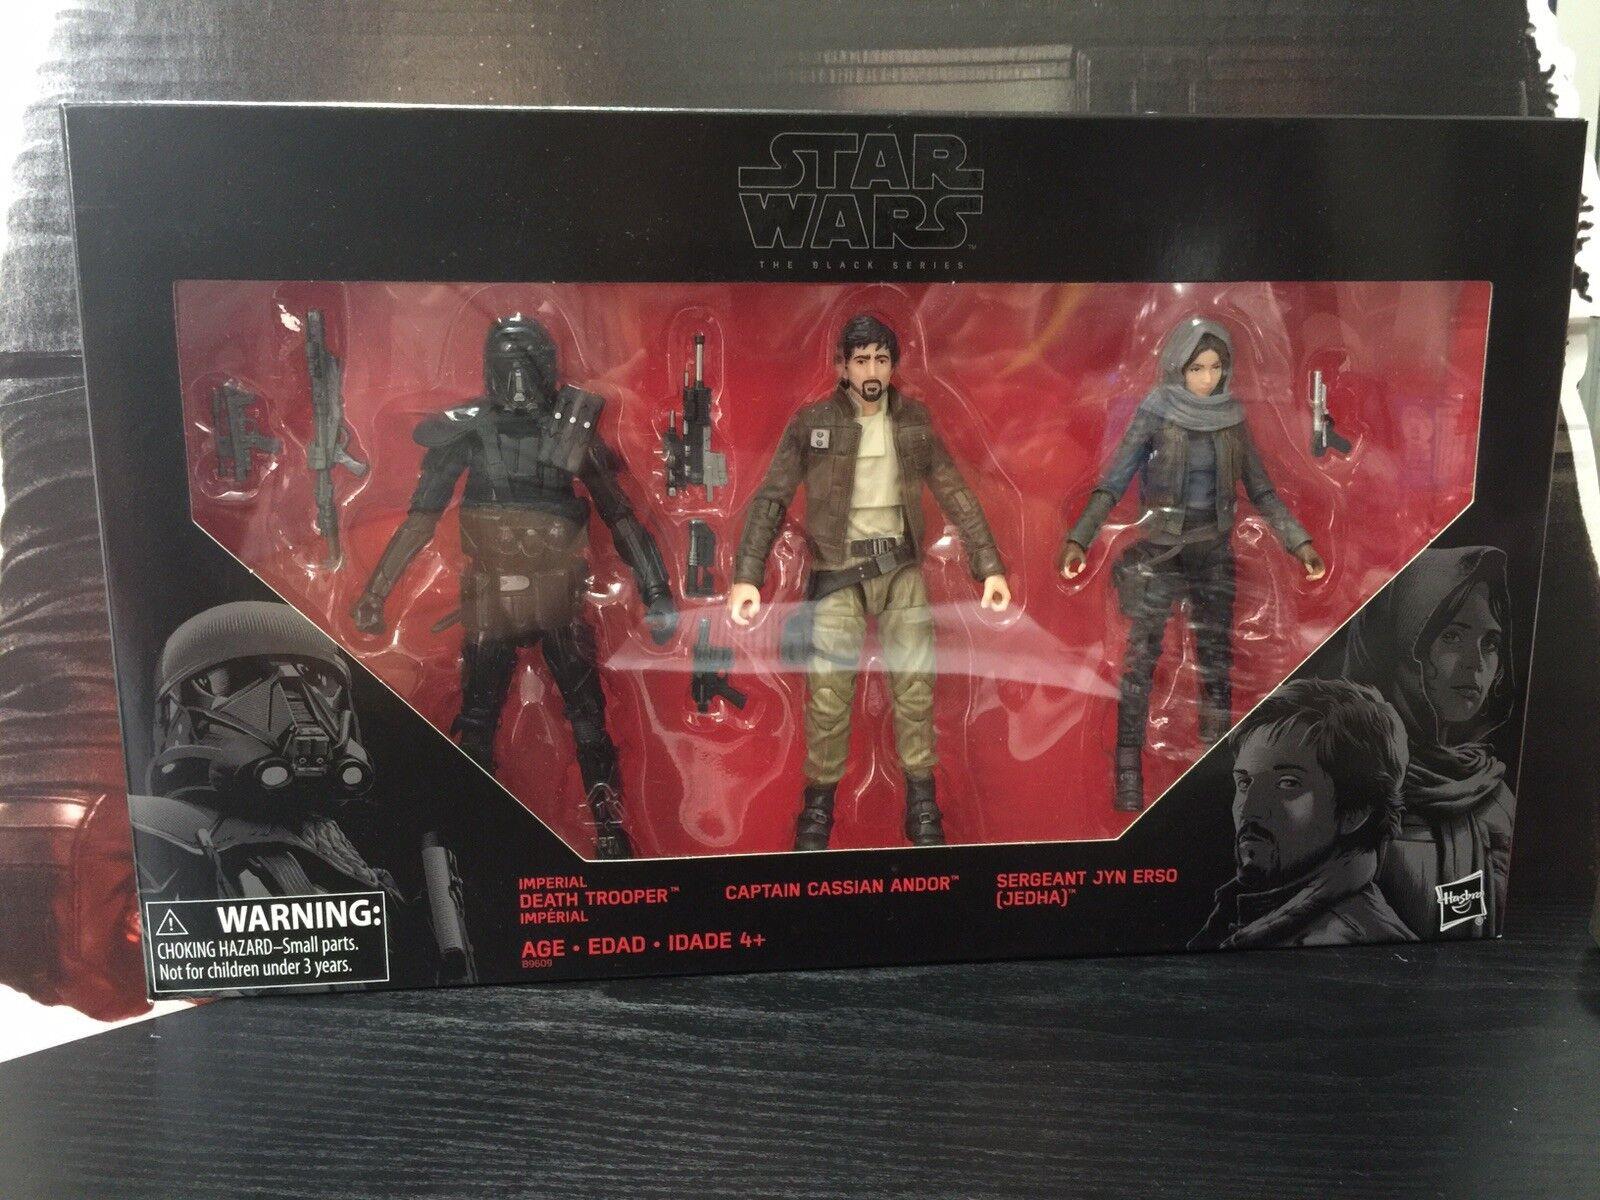 Star Wars Black Series Jyn Erso, Cassian Andor, Deathtrooper - Target Exclusive